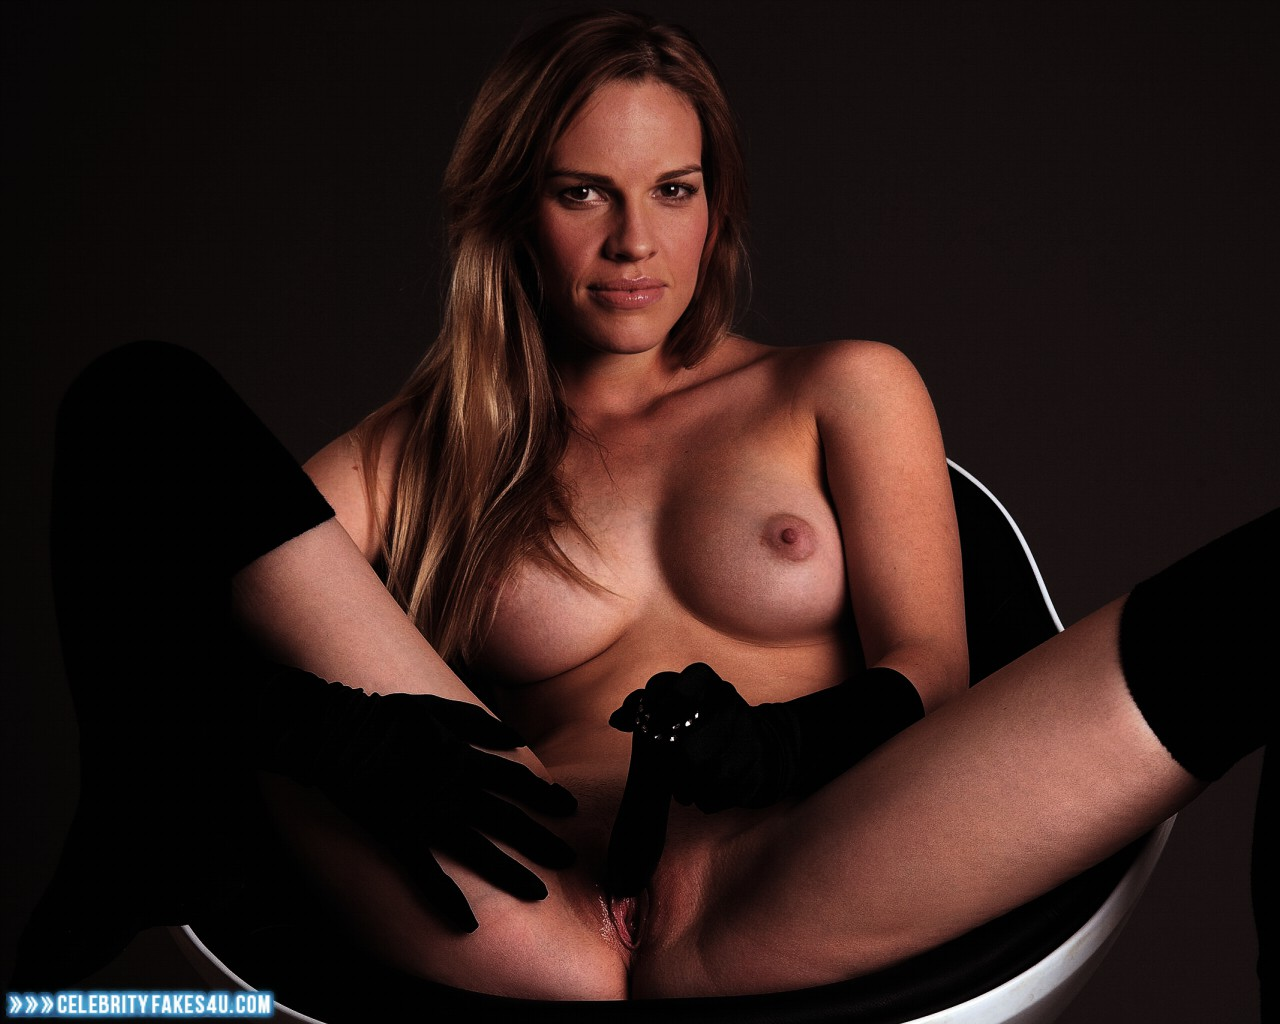 beautiful naked female breasts